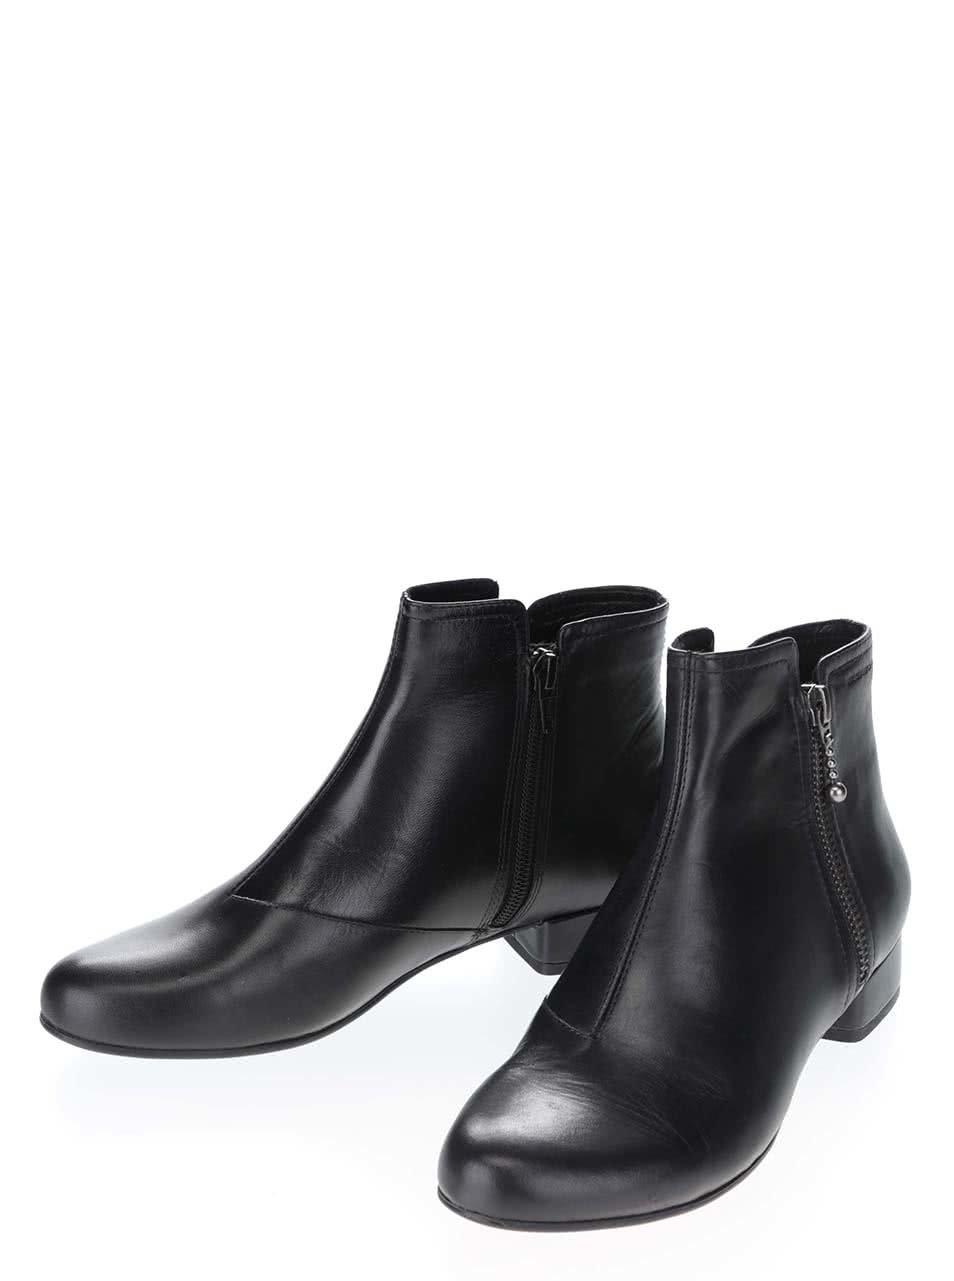 840153f5b79 Černé kotníkové kožené boty na malém podpatku Vagabond Sue ...